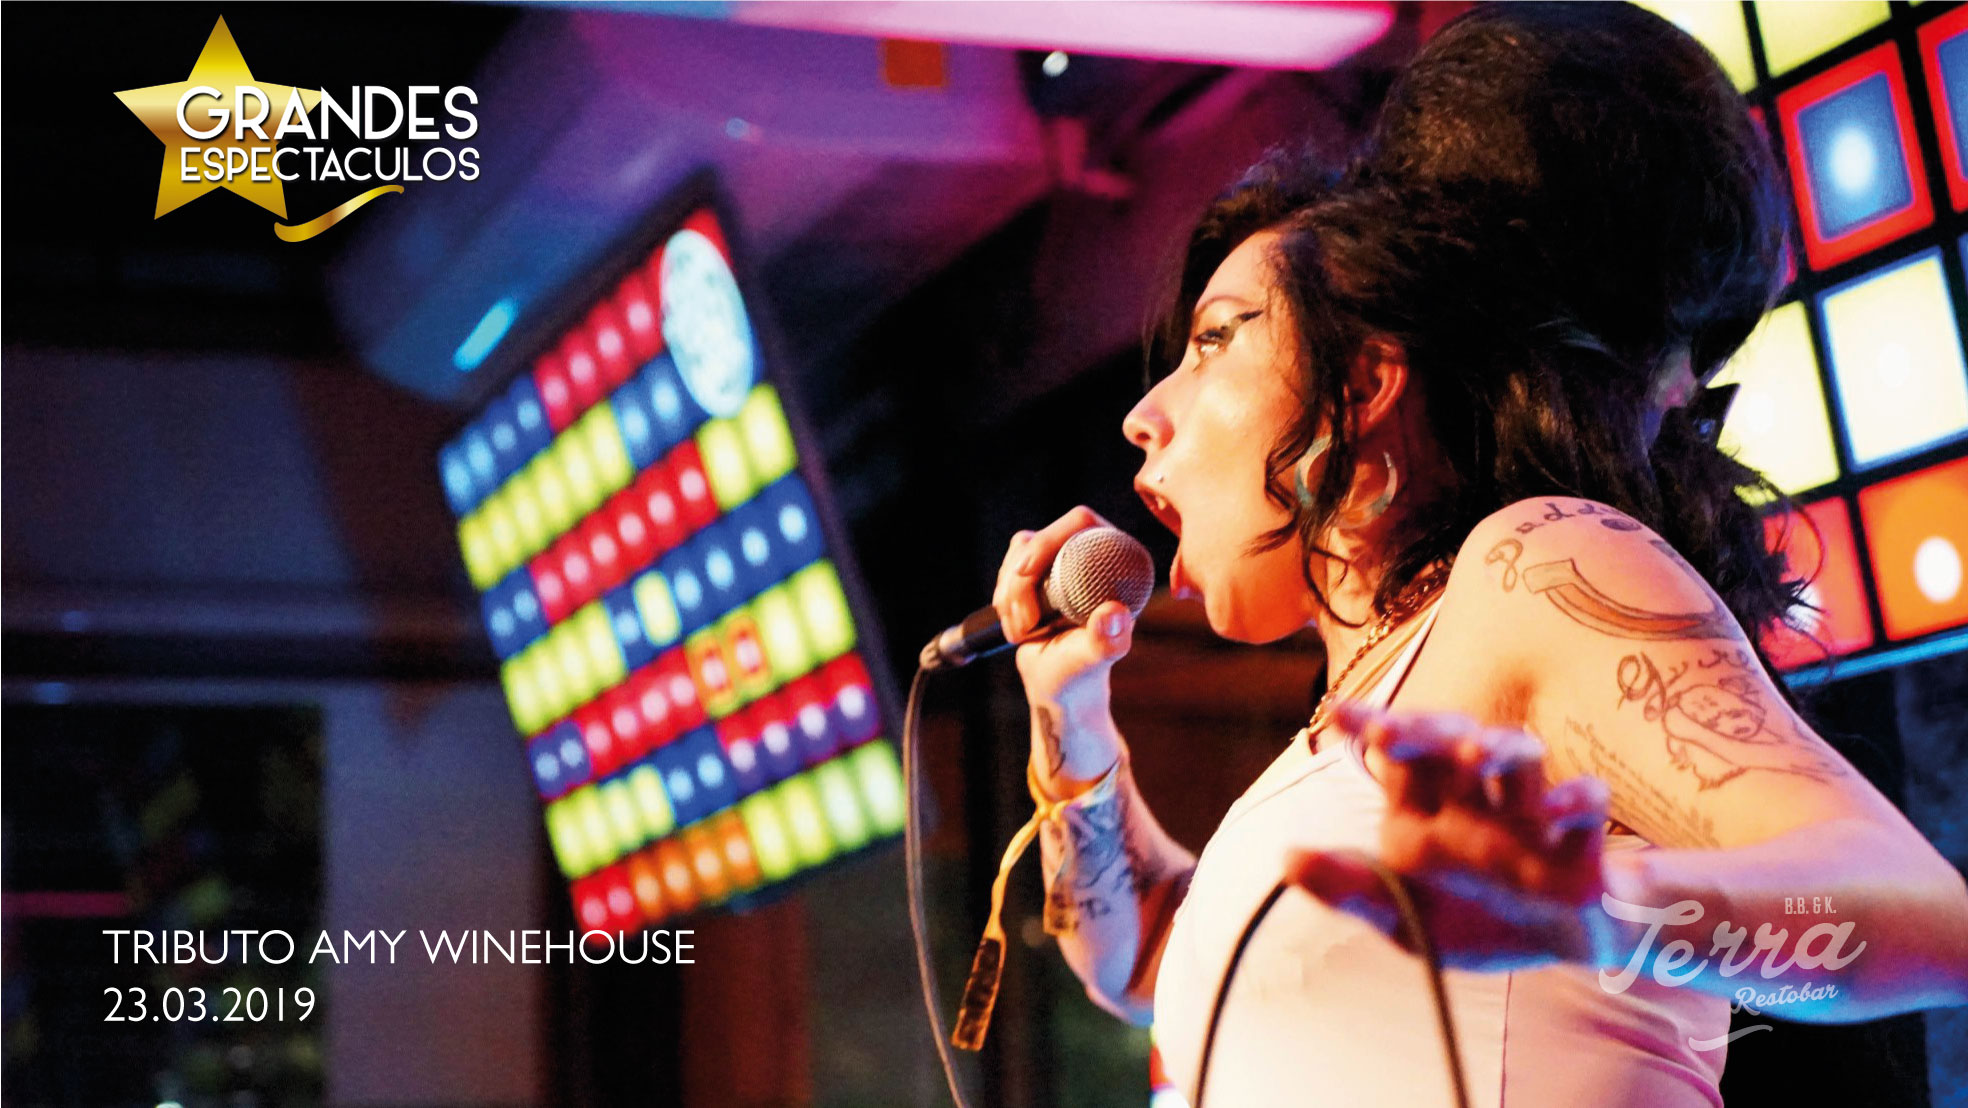 Tributo Amy Winehouse - Terra Restobar - Portada web - Gran Avenida - La-Cisterna - 13